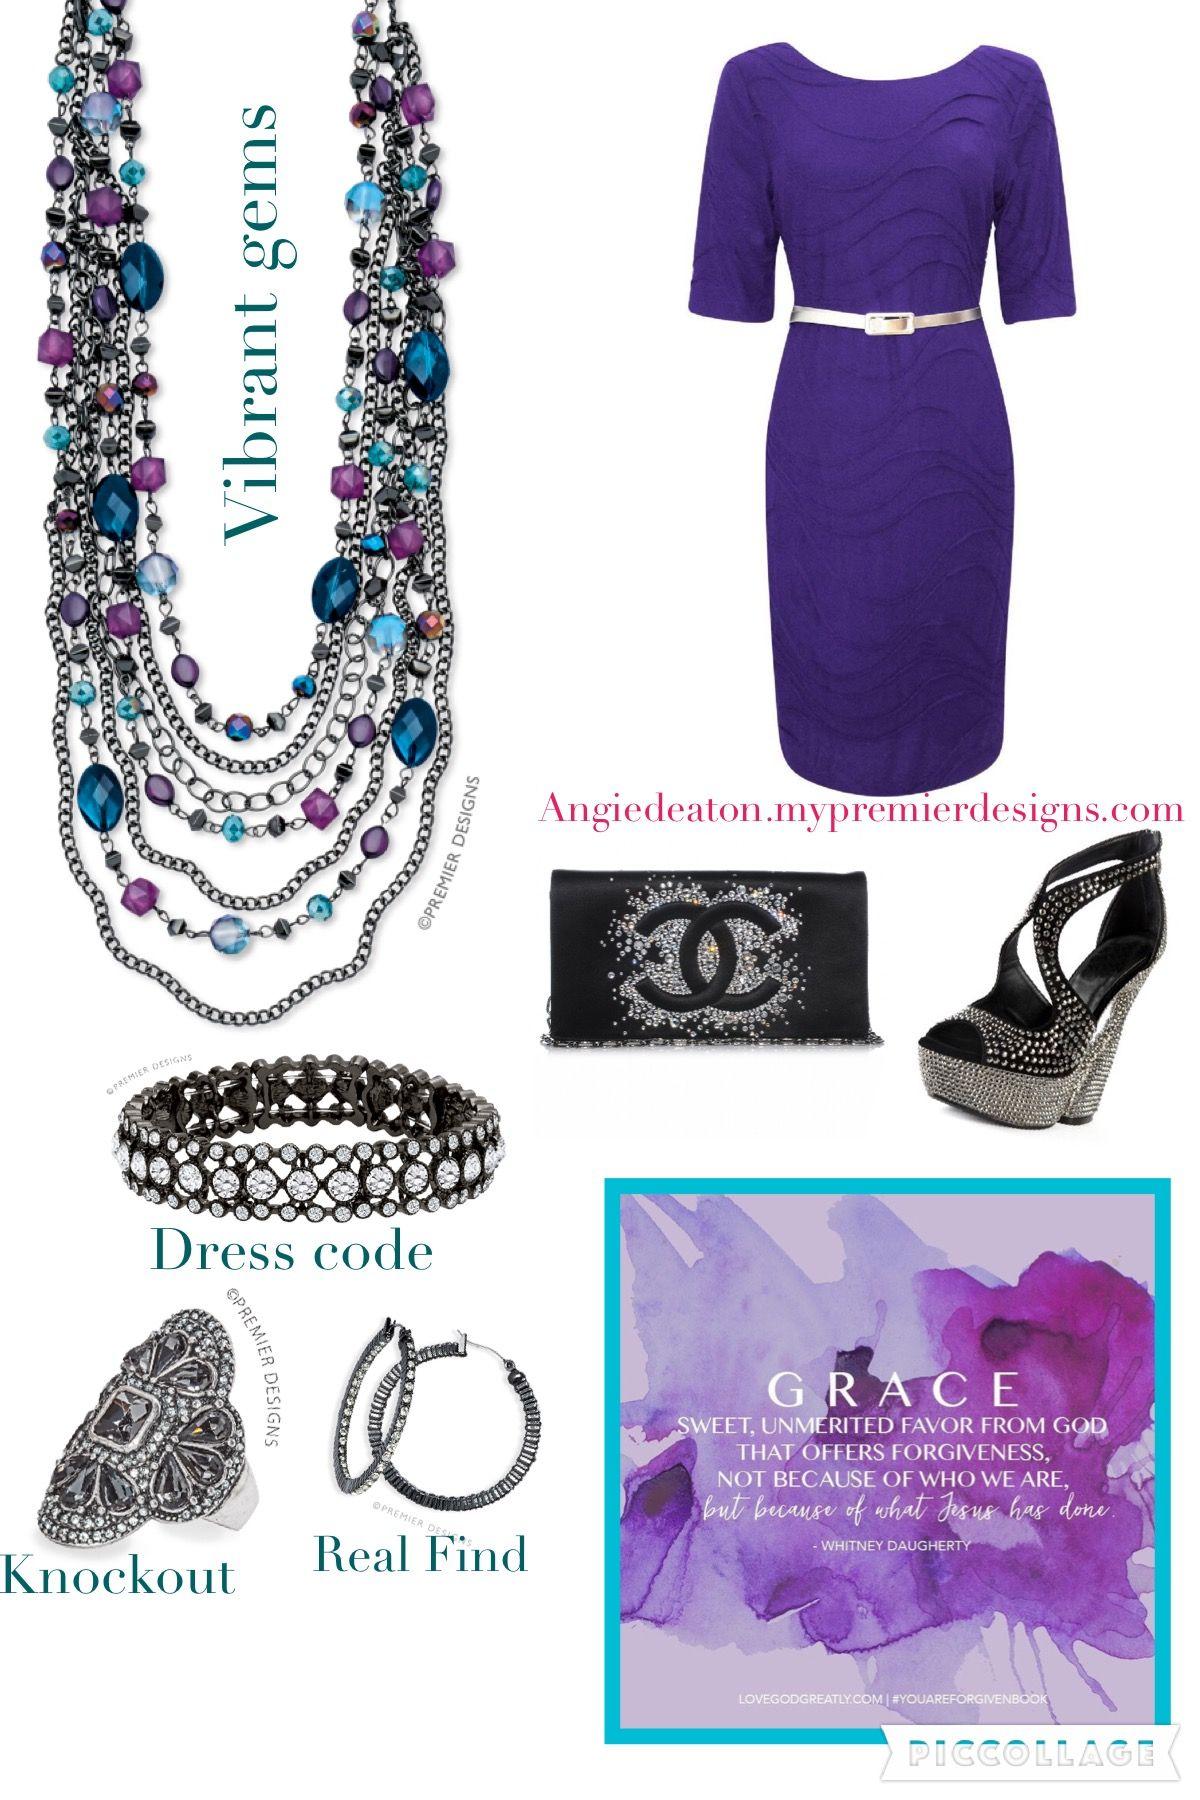 Premier designs jewelry 2015 - Premier Designs Jewelry By Shawna Digital Catalog Http Shawnawatson Mypremierdesigns